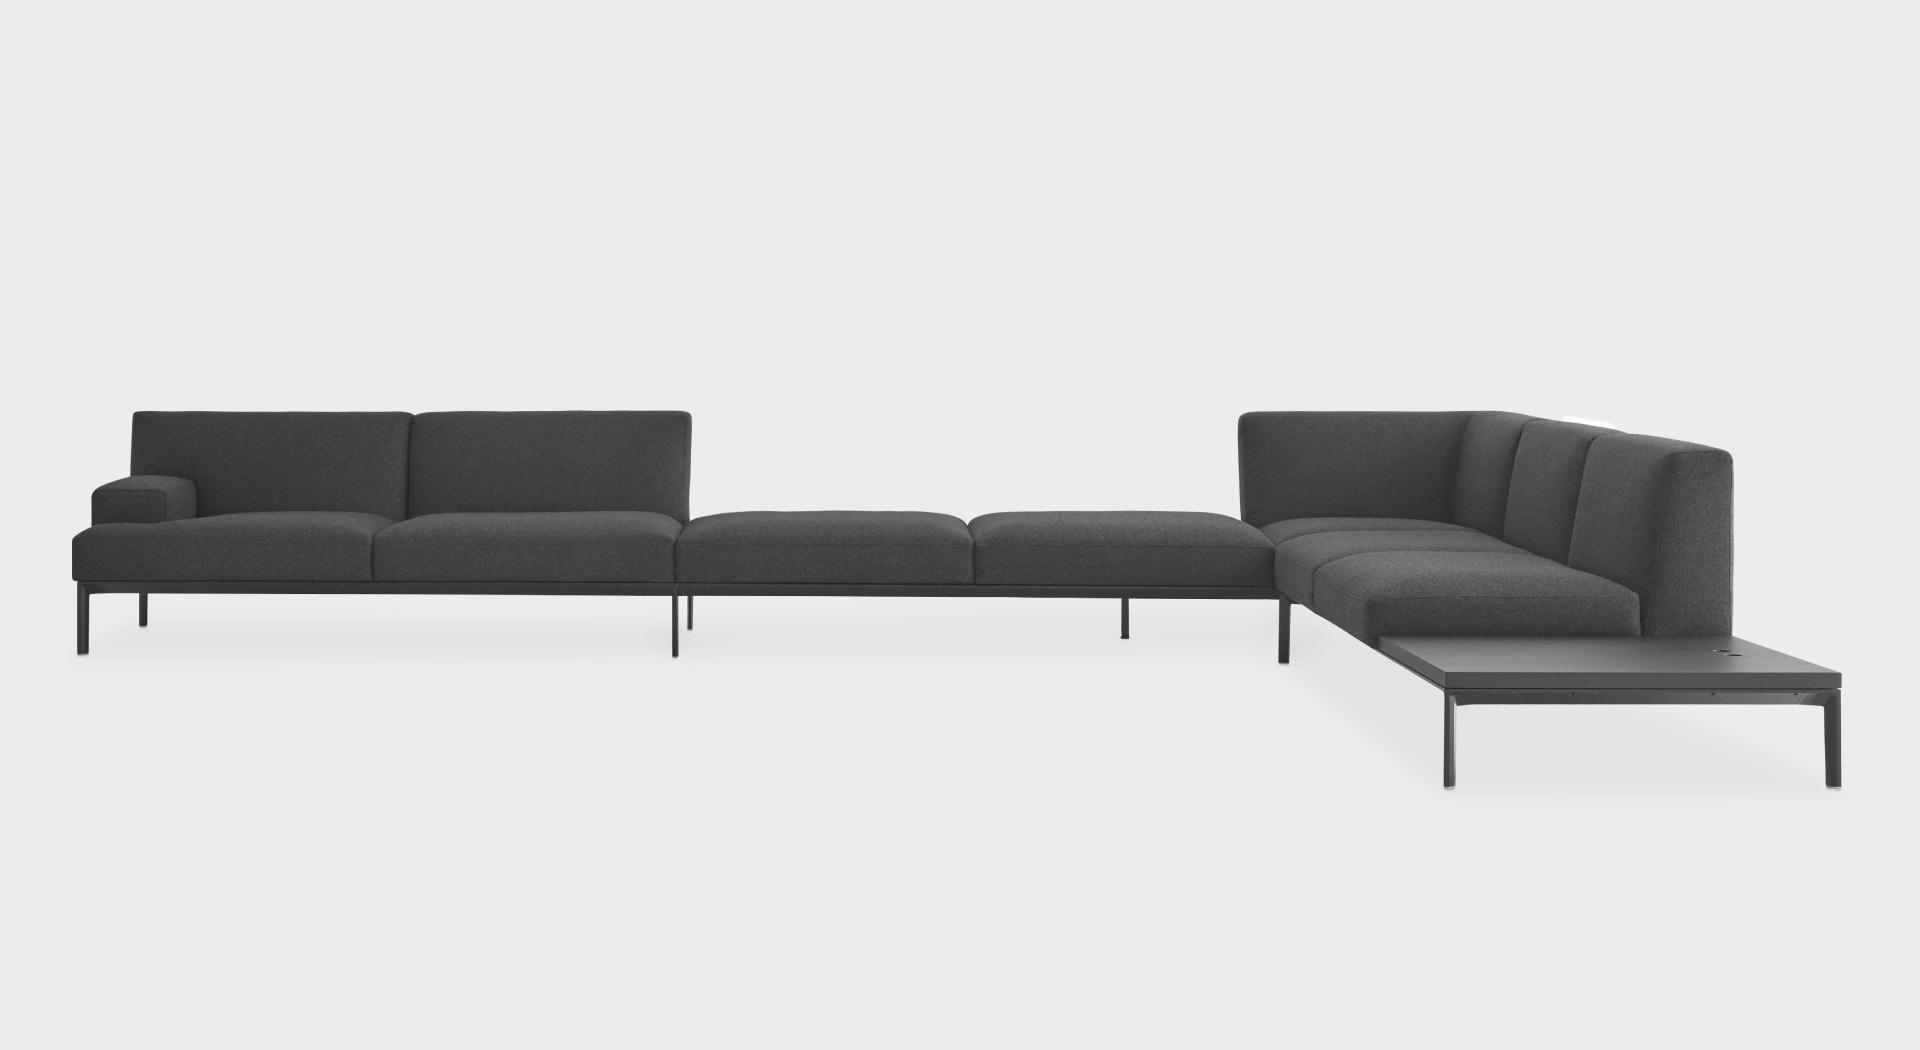 ADD SOFT L_shape big open | Corner sofa: modular system with ...